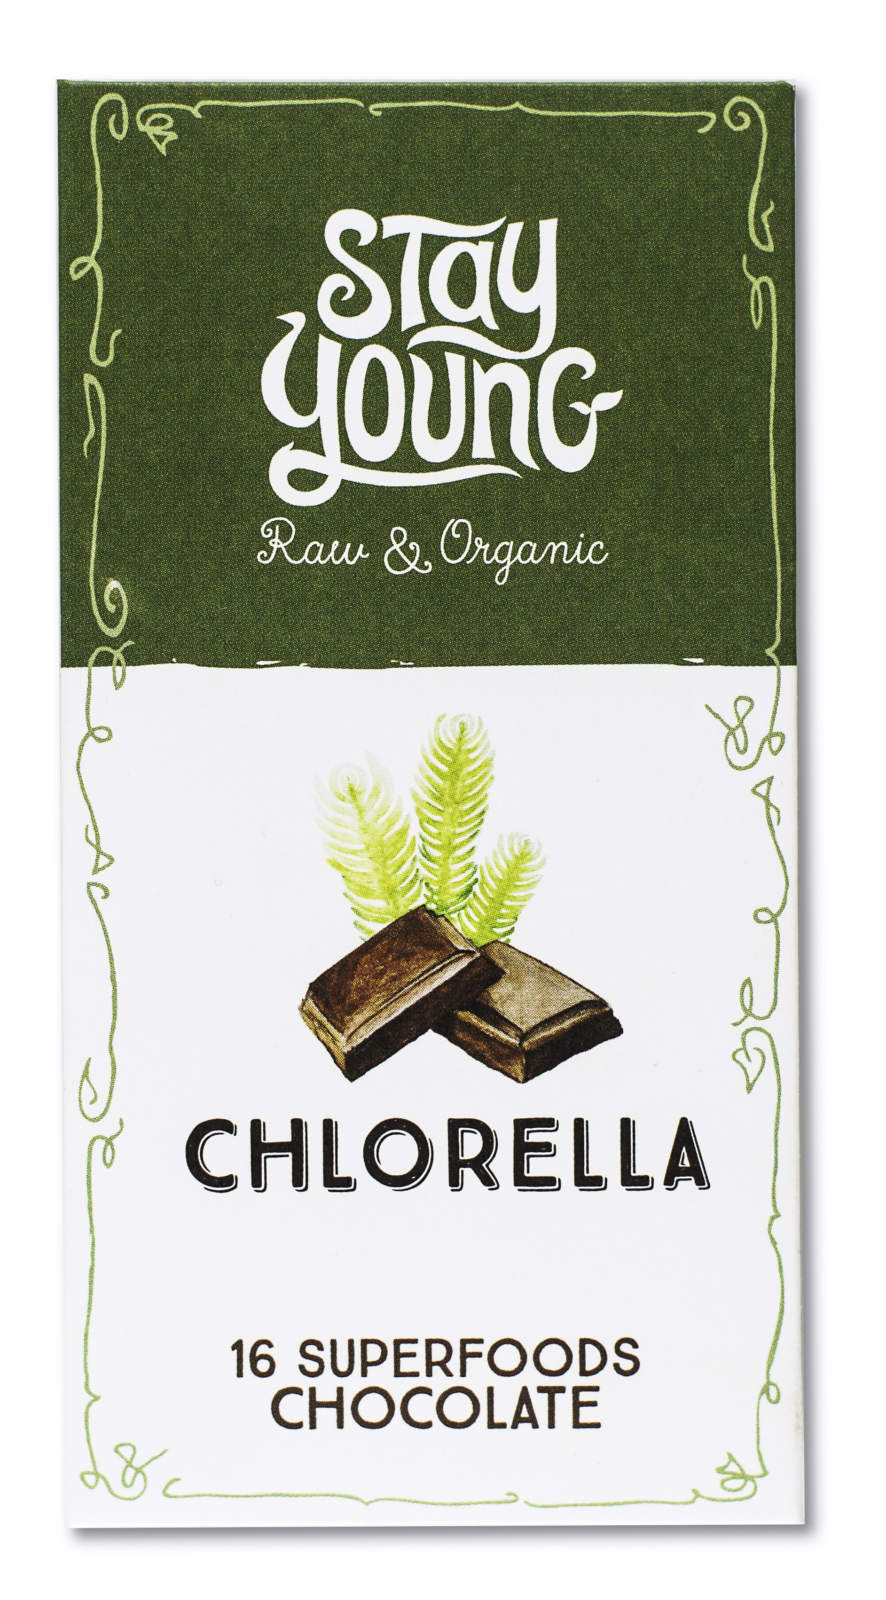 ChlorellaFront